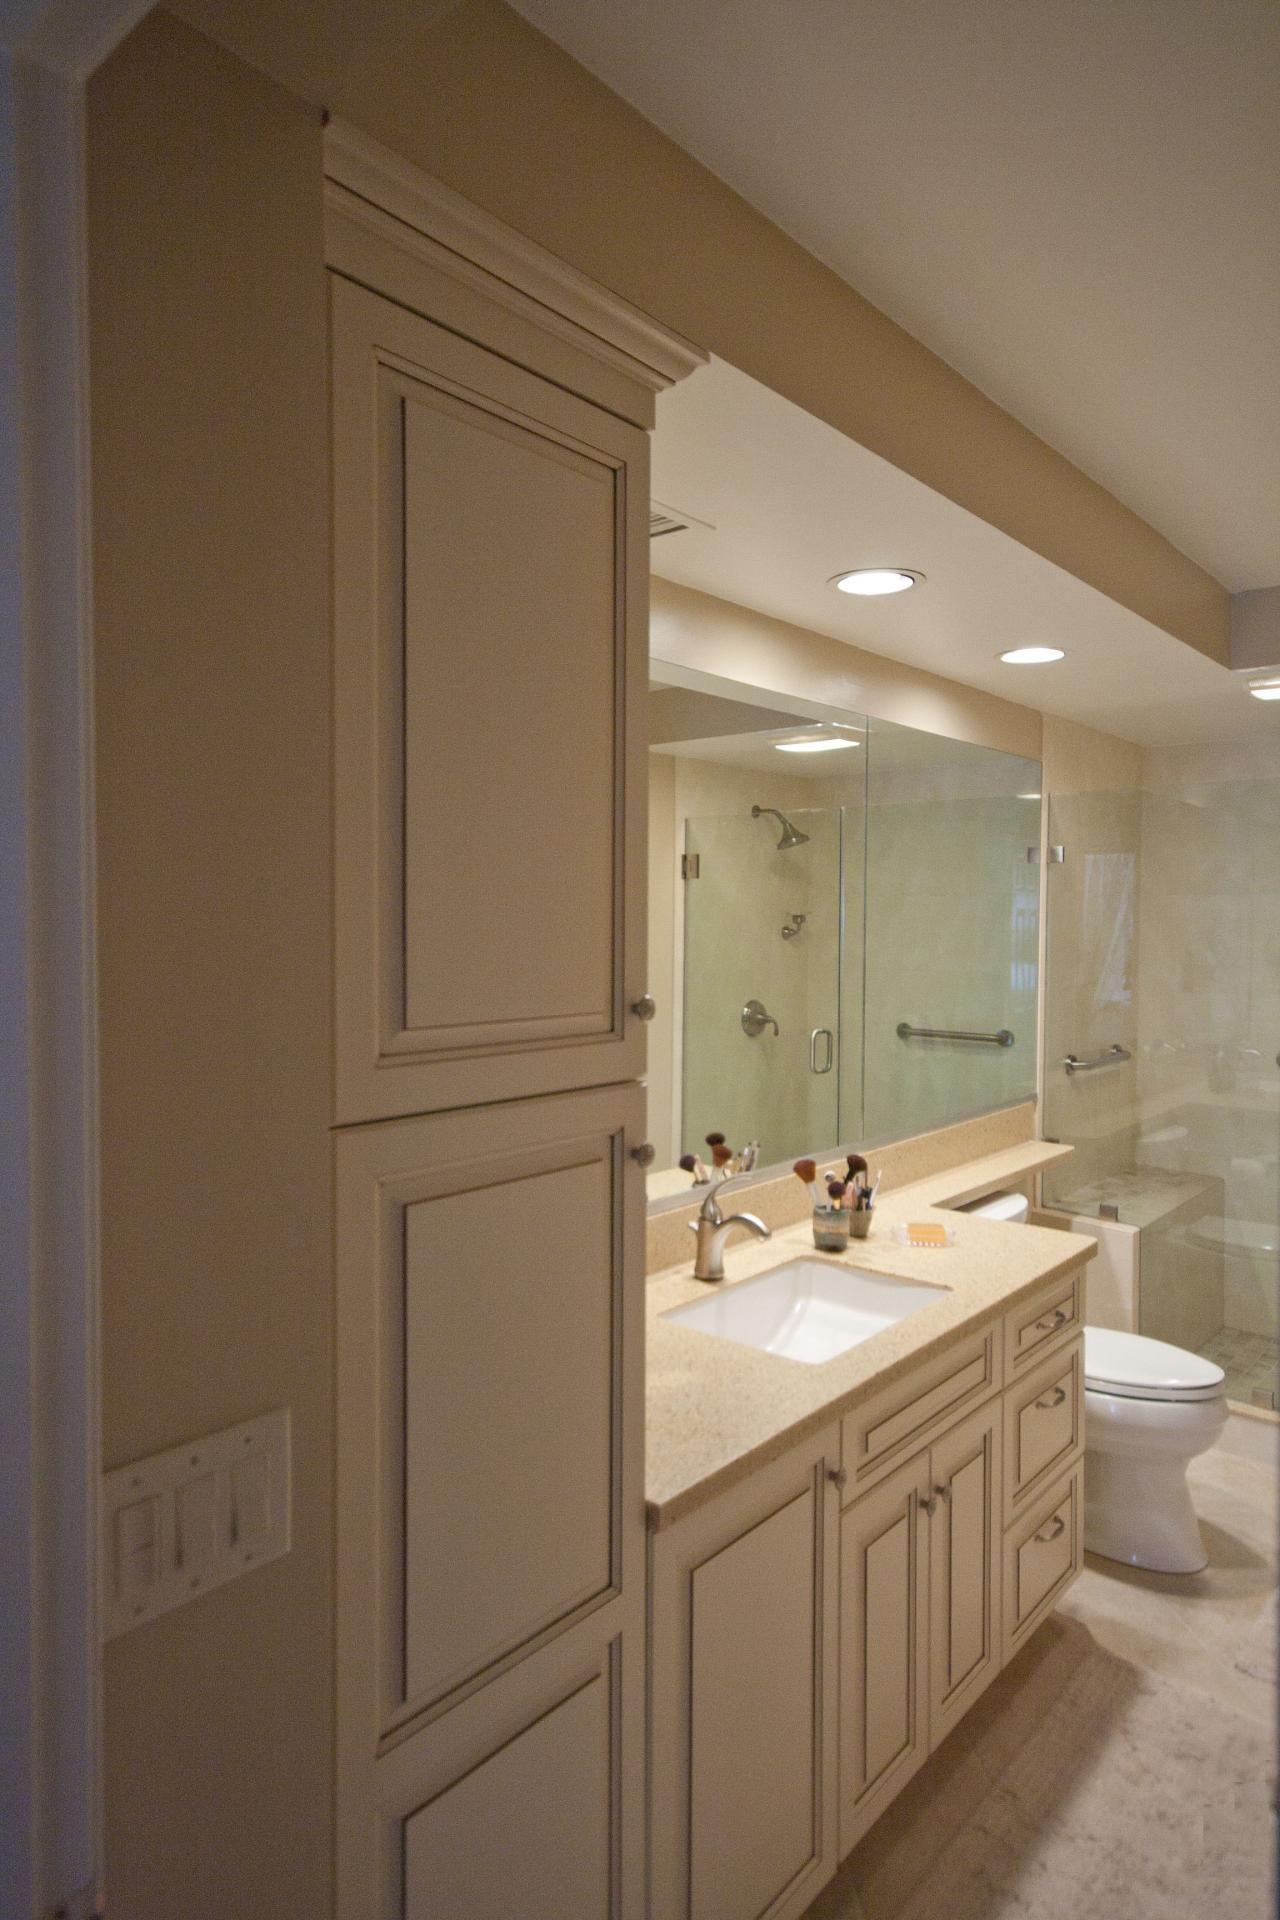 Apartment Bathroom Organization Shower